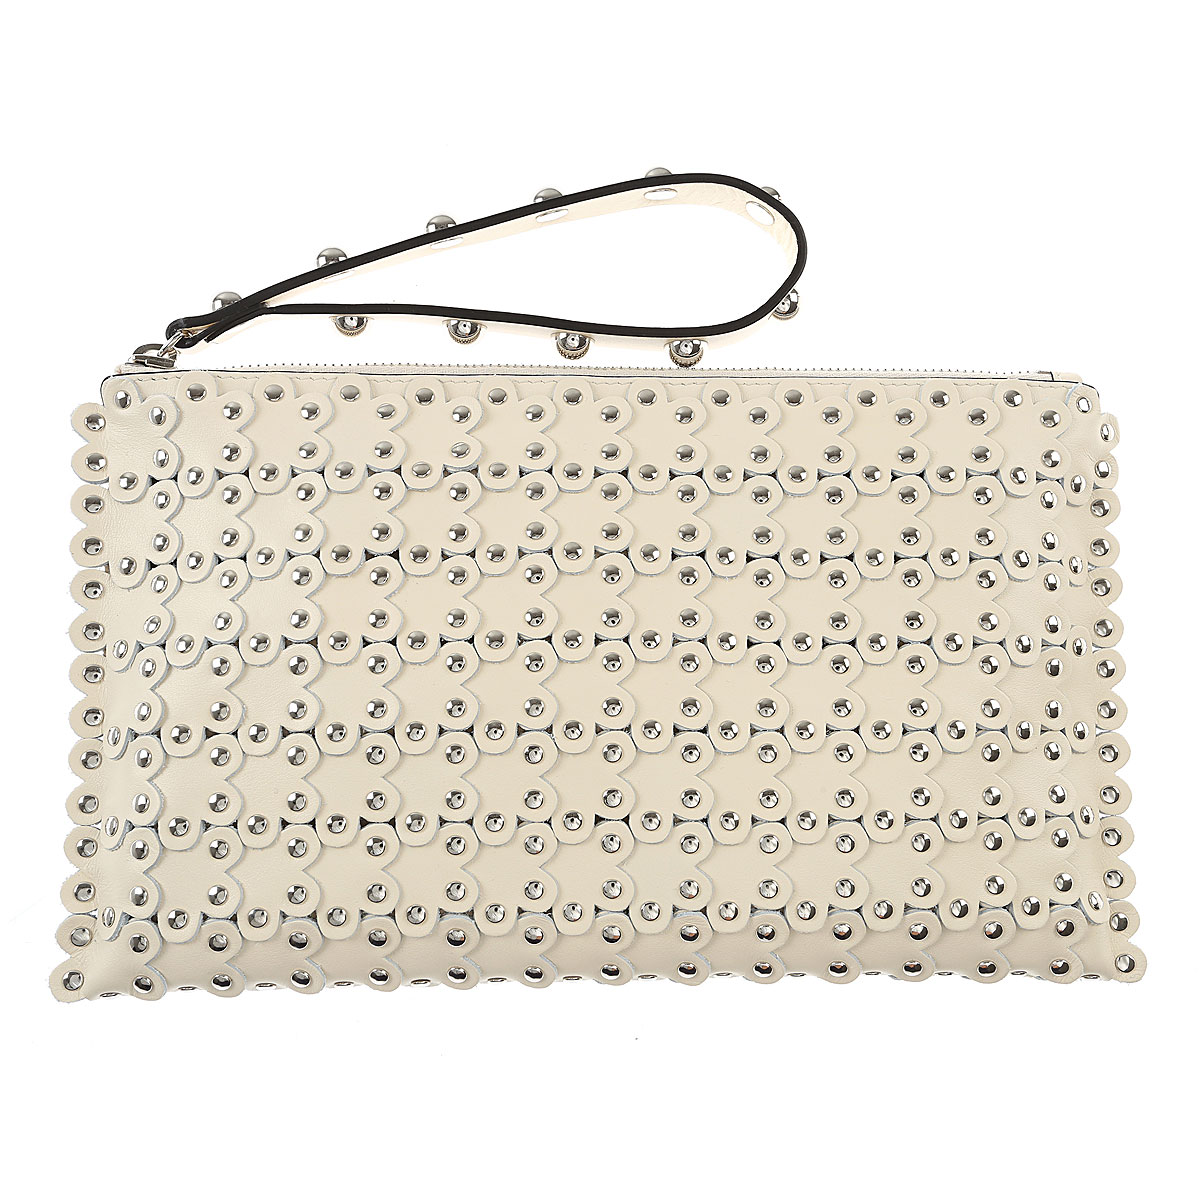 Valentino Clutch Bag, Red Valentino, Ivory, Leather, 2017 USA-456017